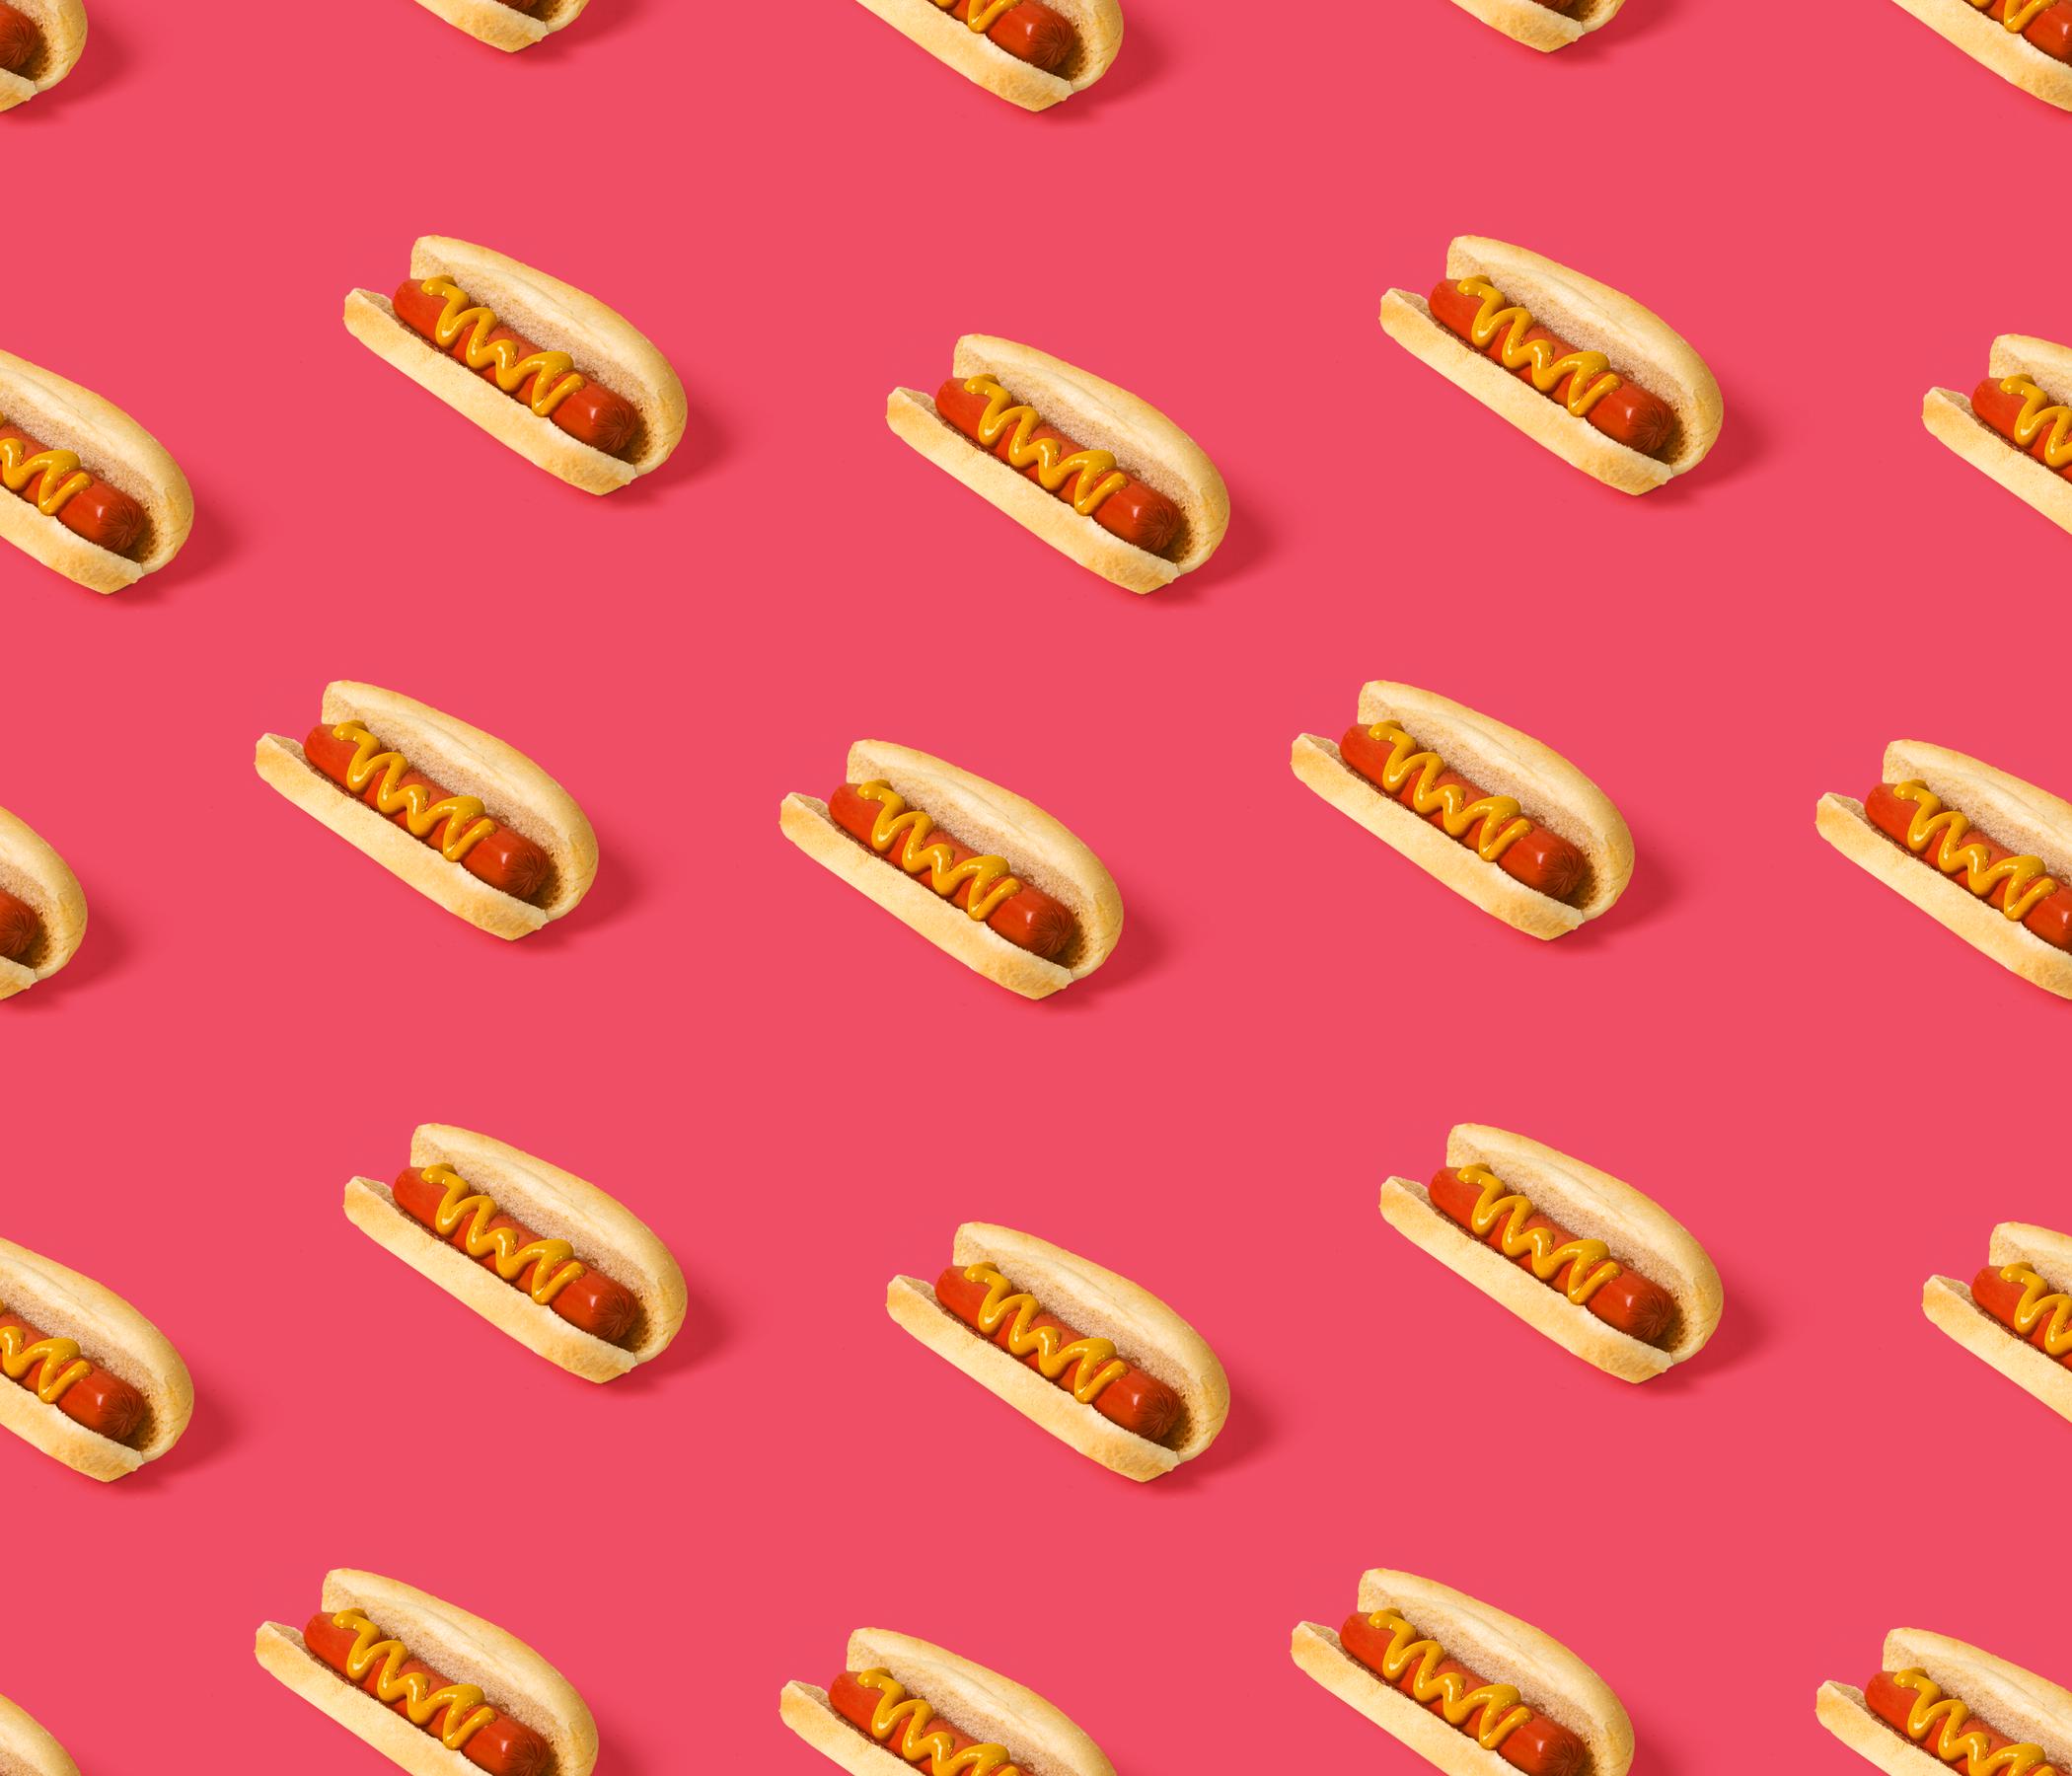 Hotdog red tileable